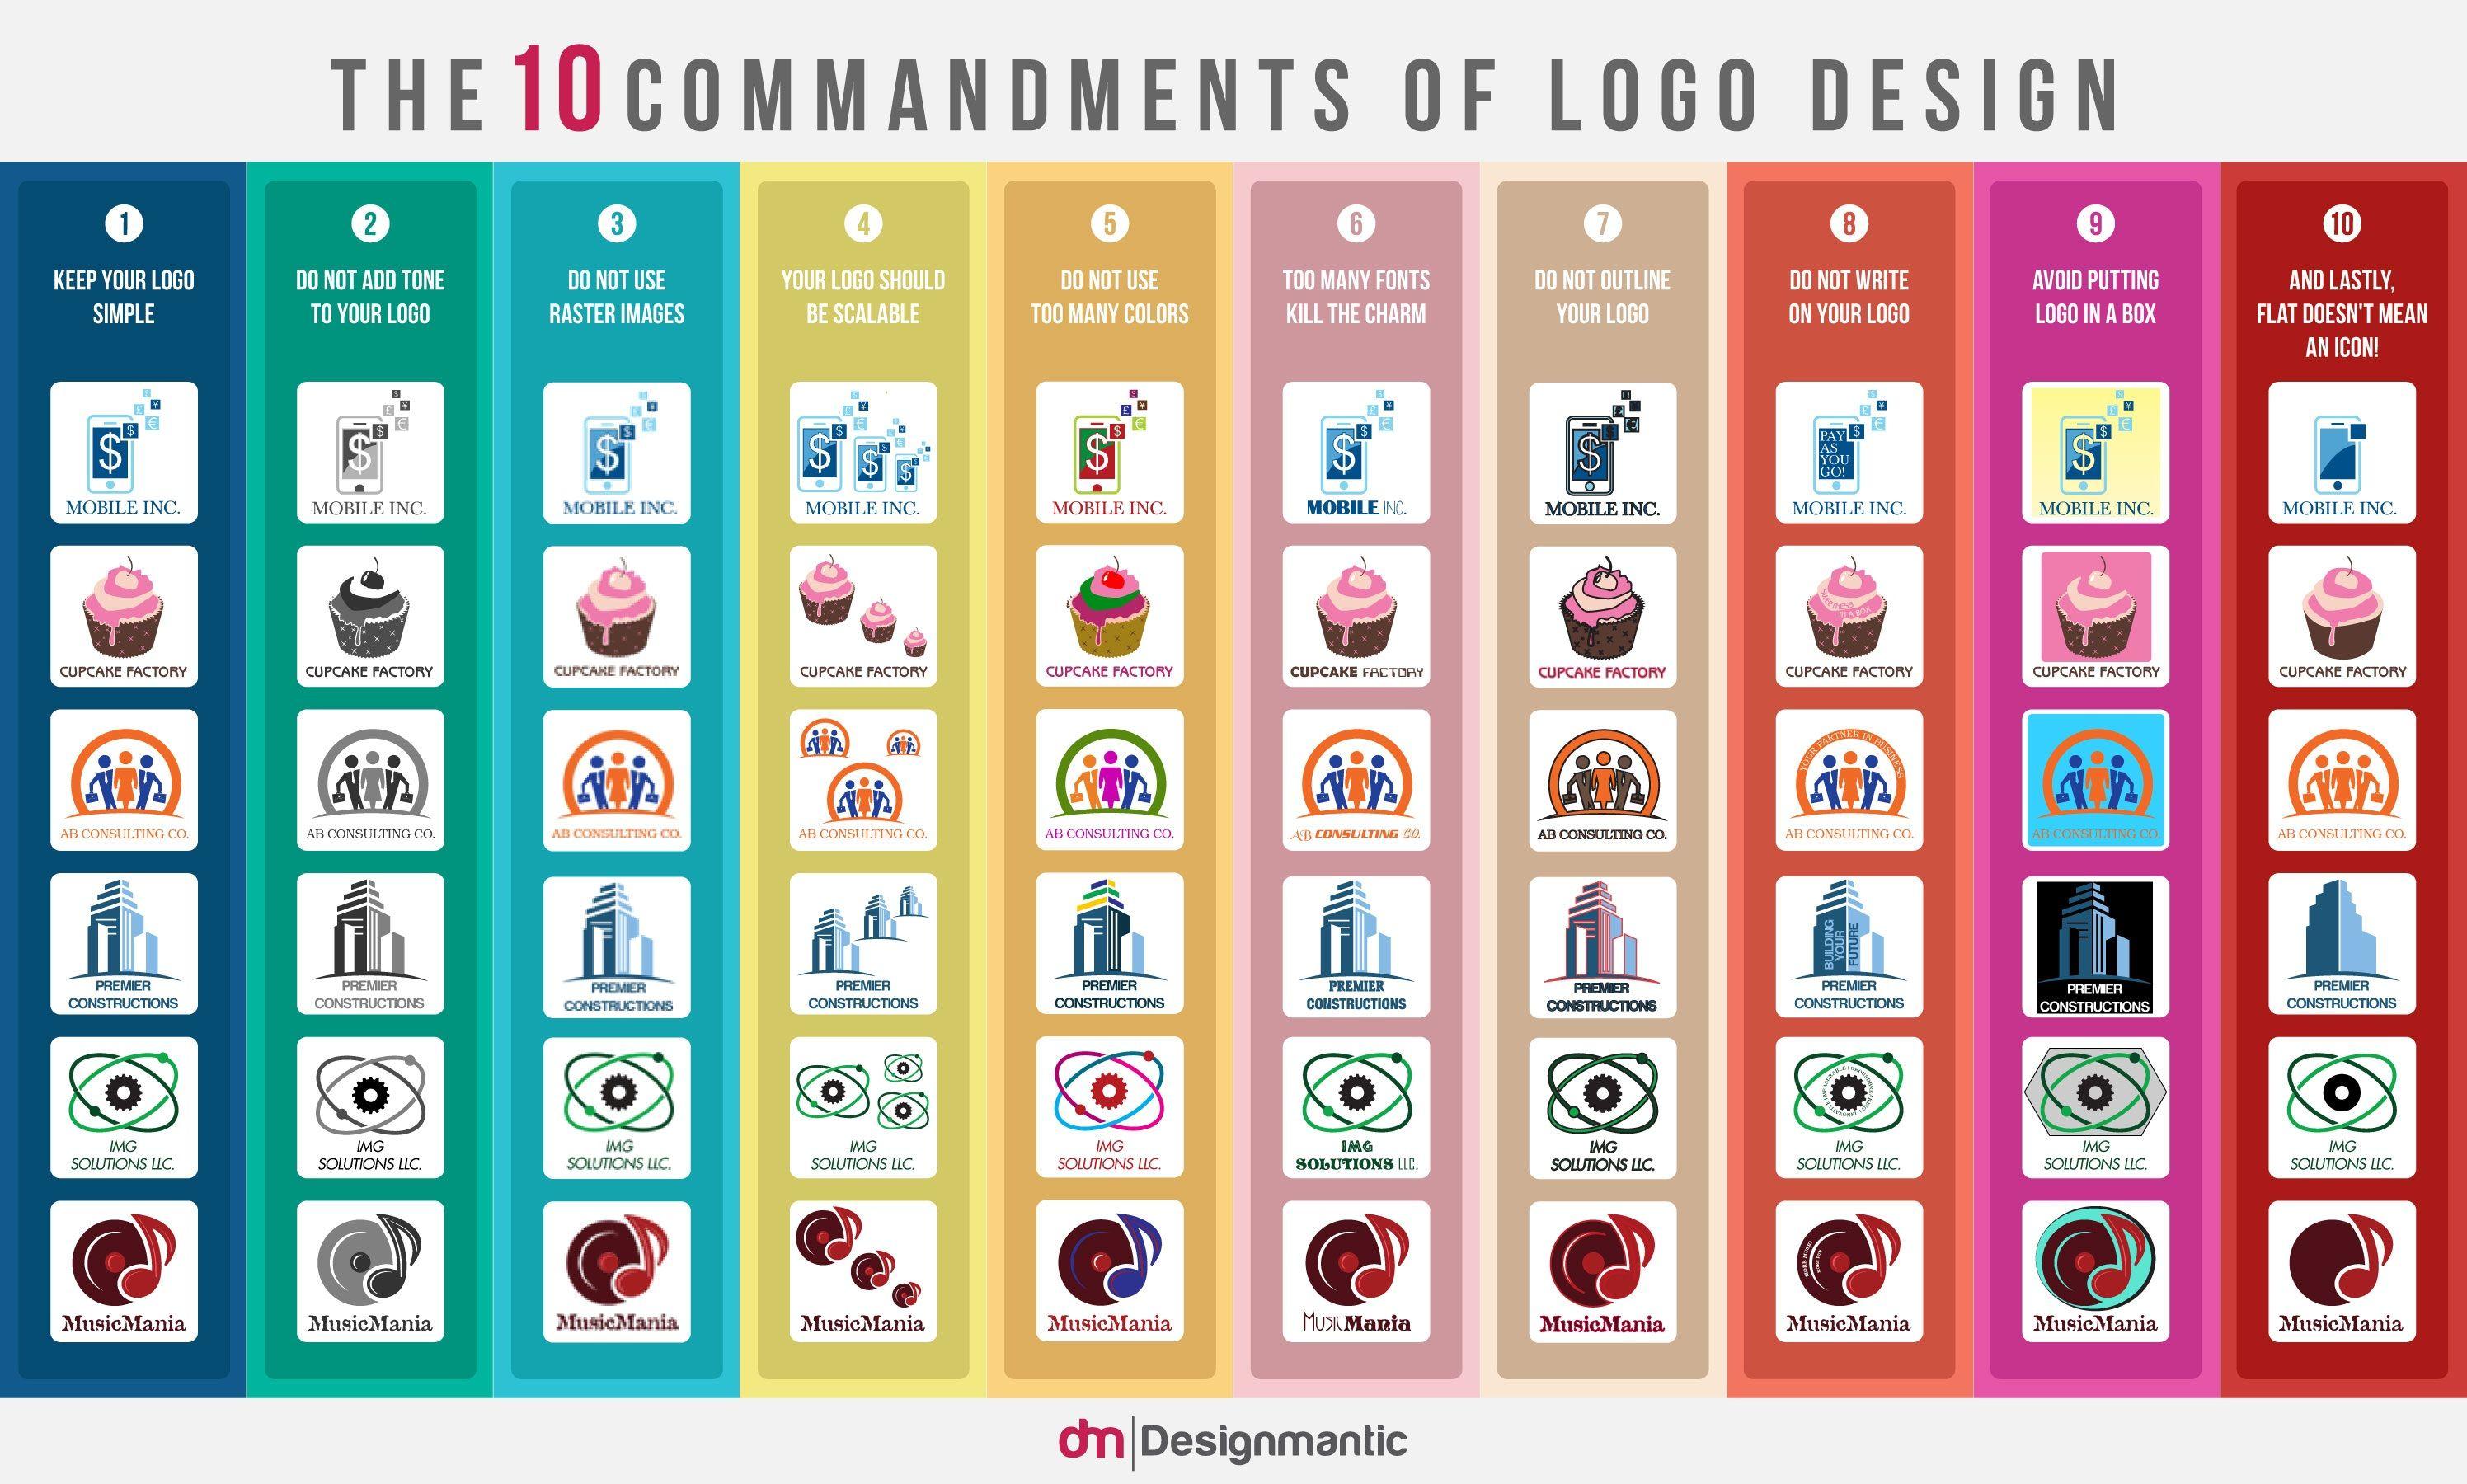 CommandmentsOfLogoDesignJpg   Formacin